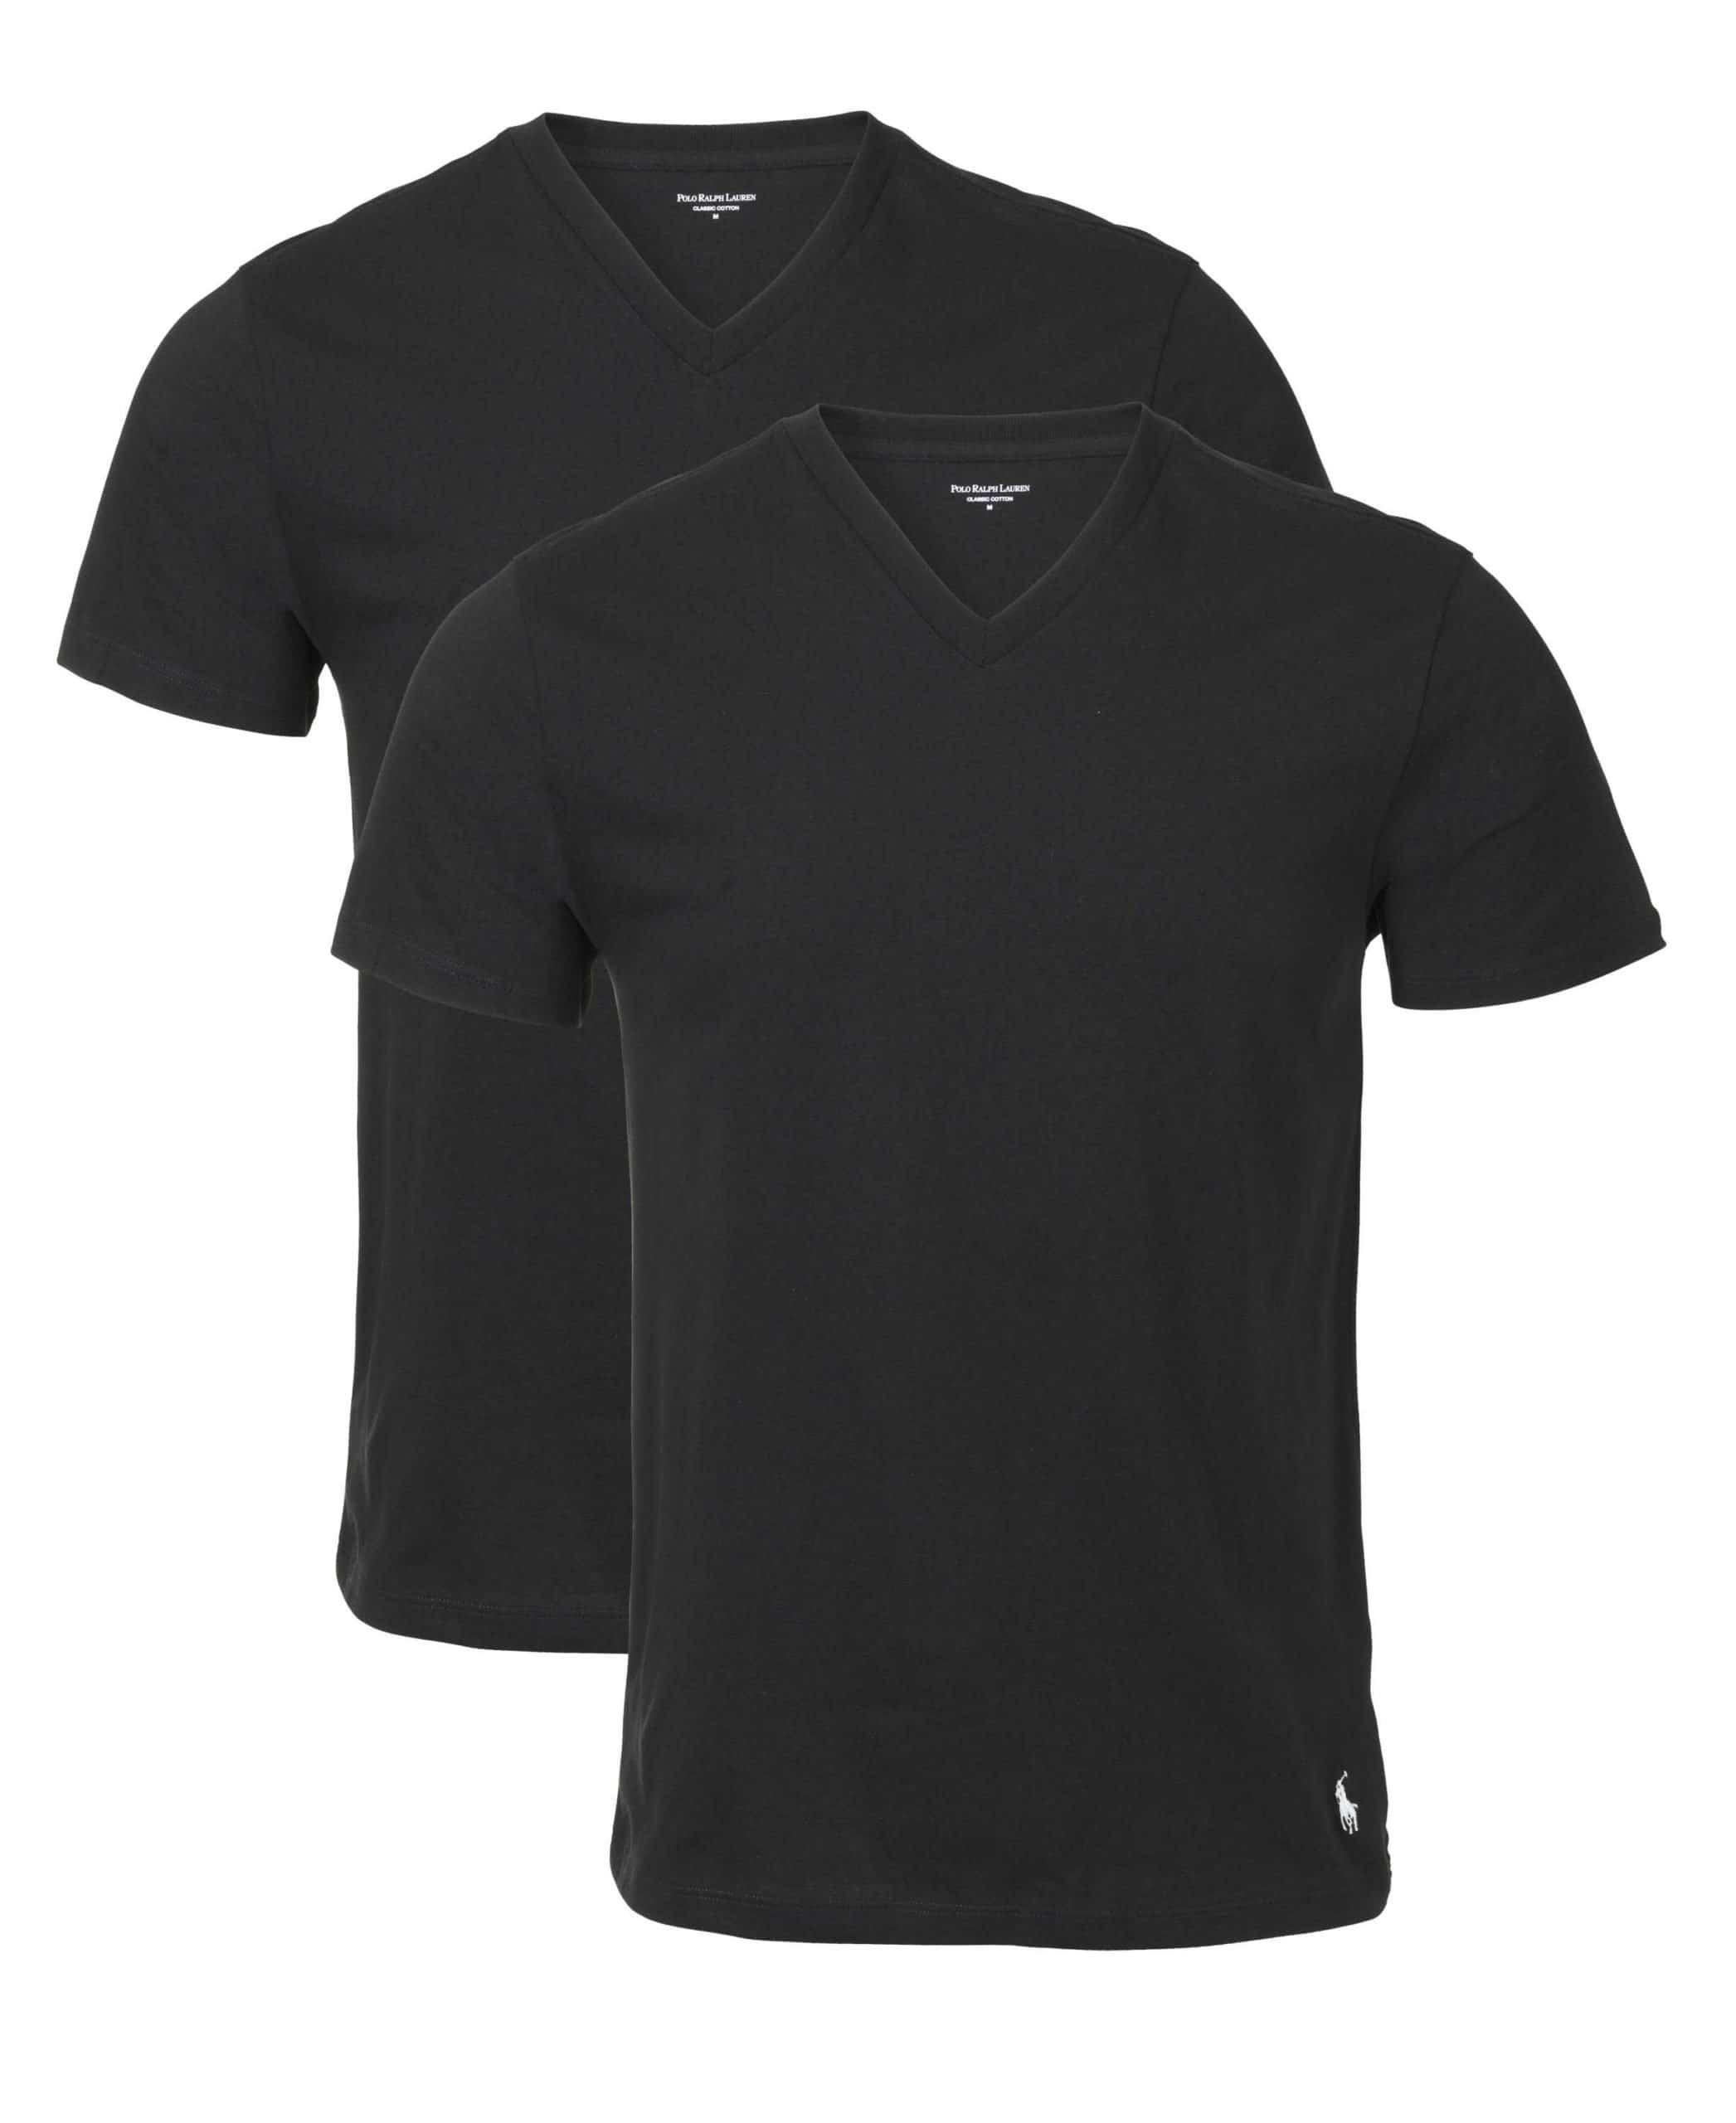 Ralph Lauren Classic V-Neck T-Shirts 2 Pack